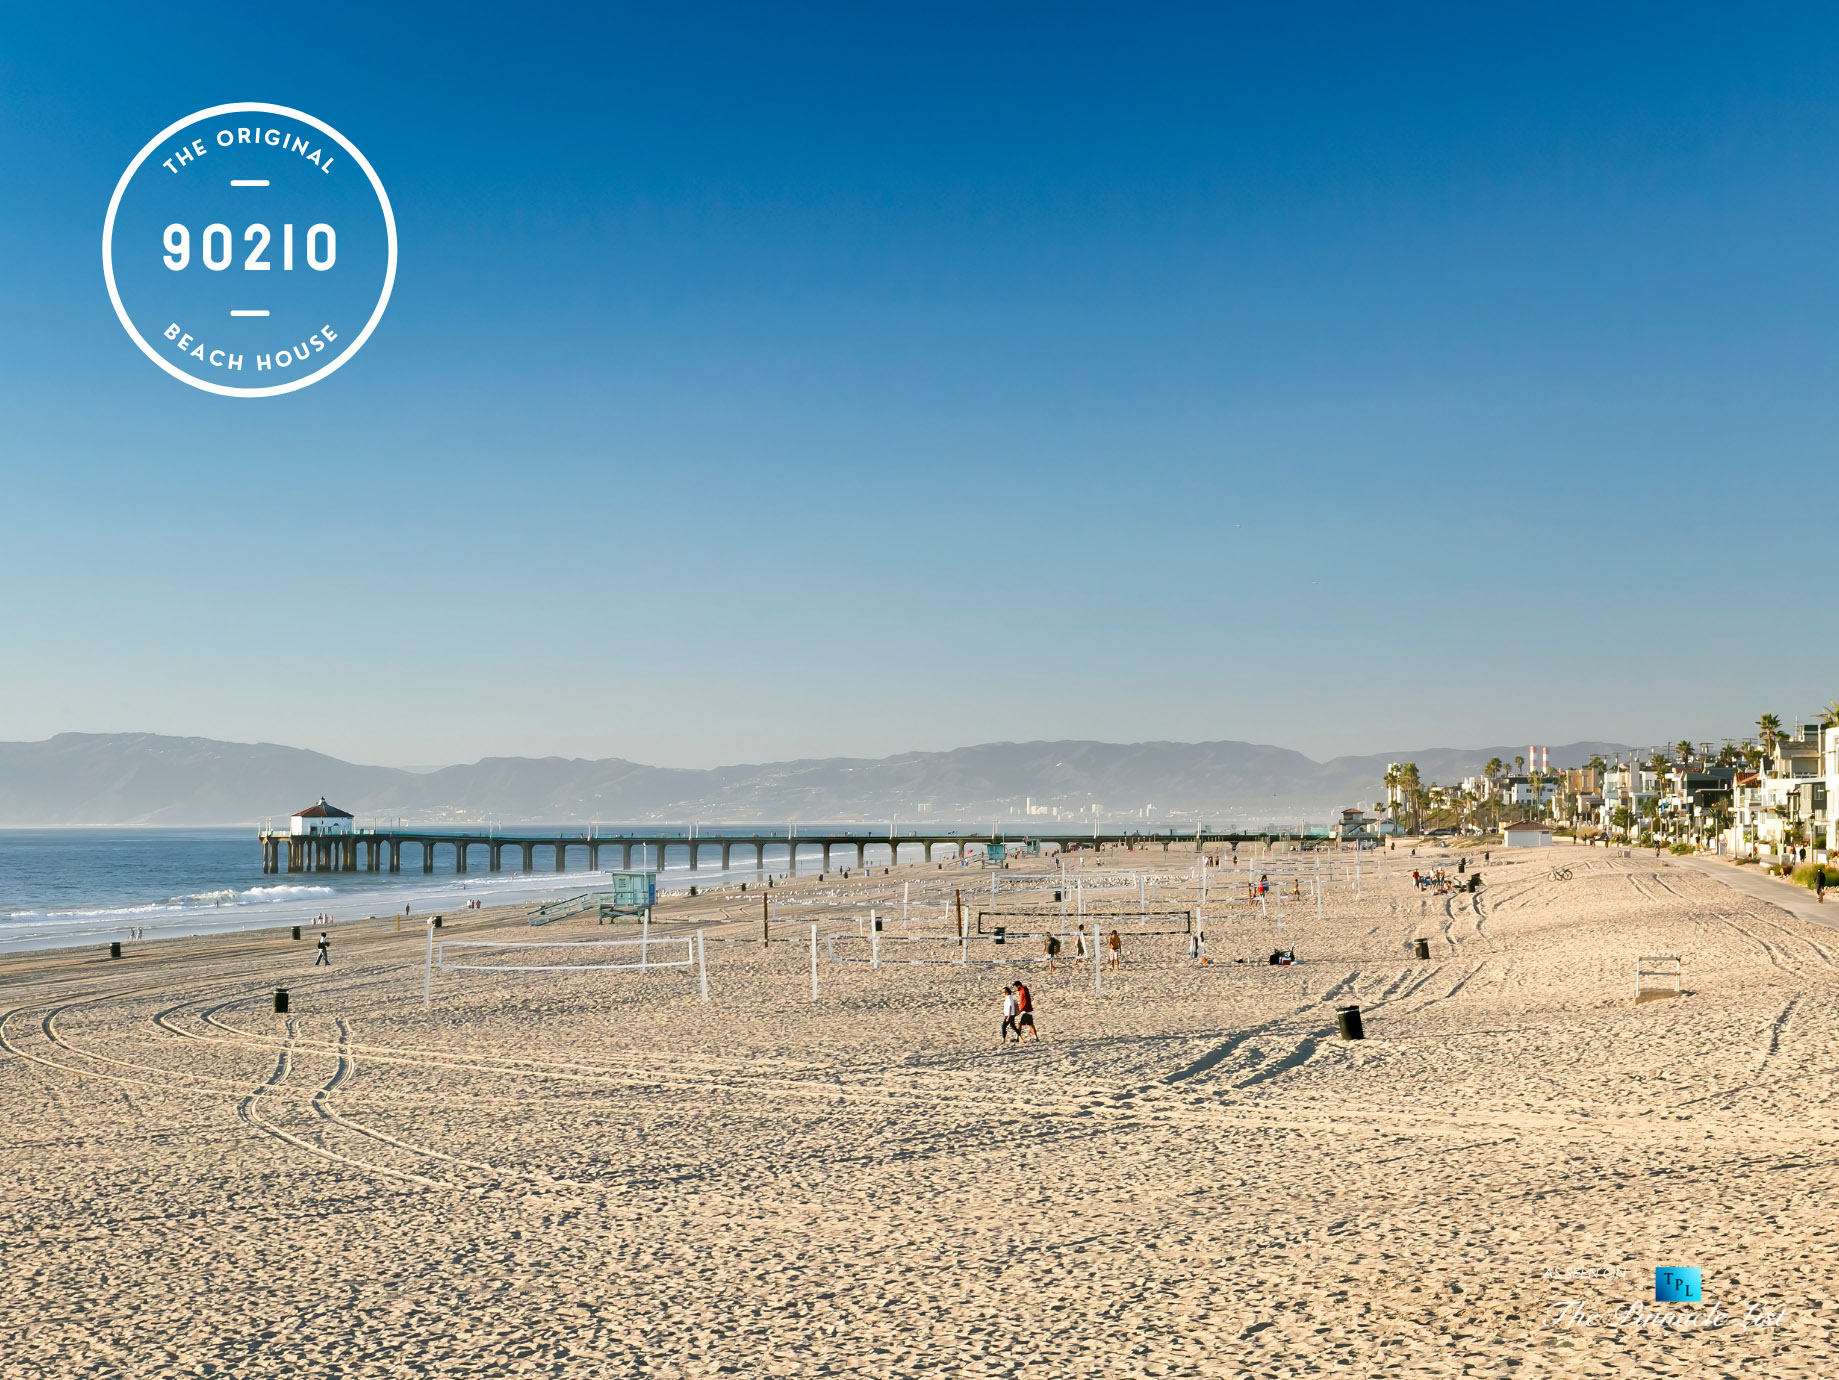 The Original 90210 Beach House – 3500 The Strand, Hermosa Beach, CA, USA – Hermosa Beach Pier